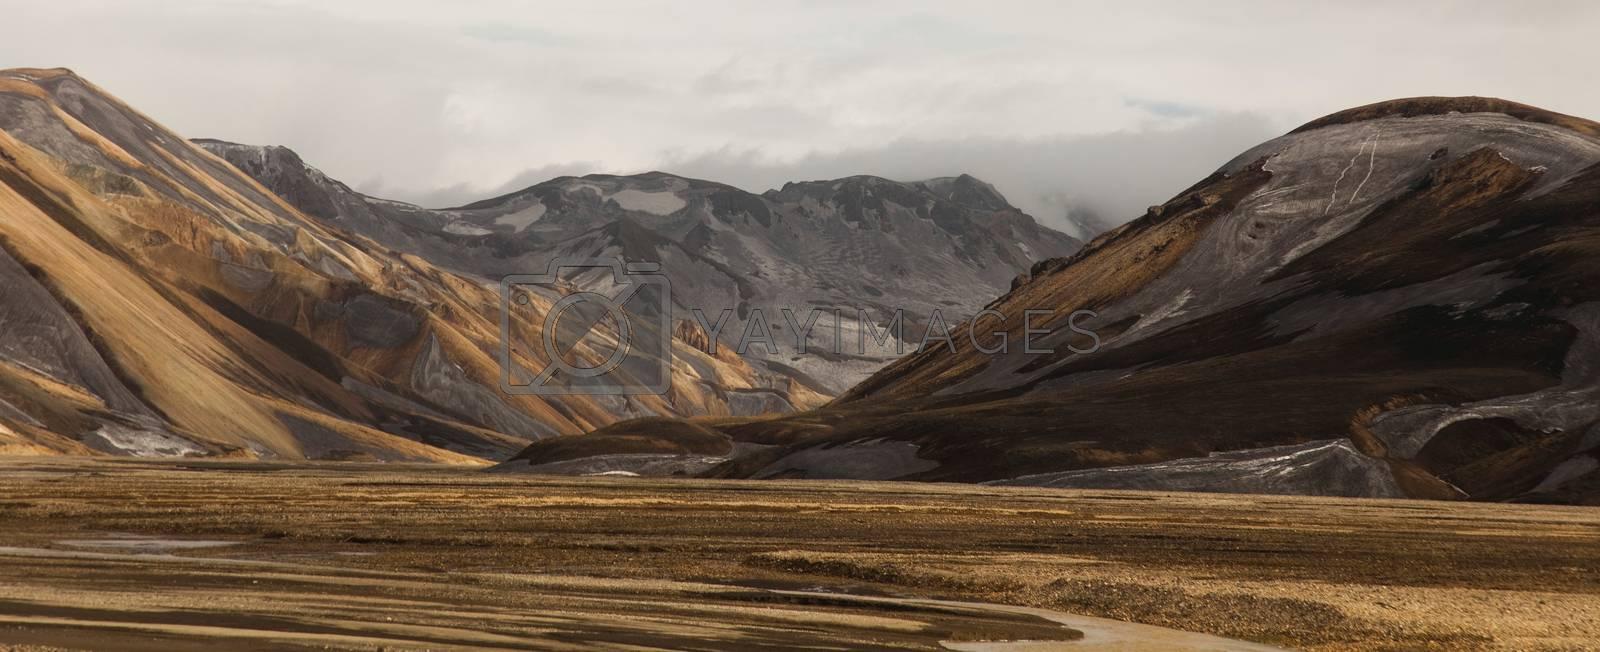 Mountain landscape , Landmannalaugar,Iceland, bright colorful vivid theme